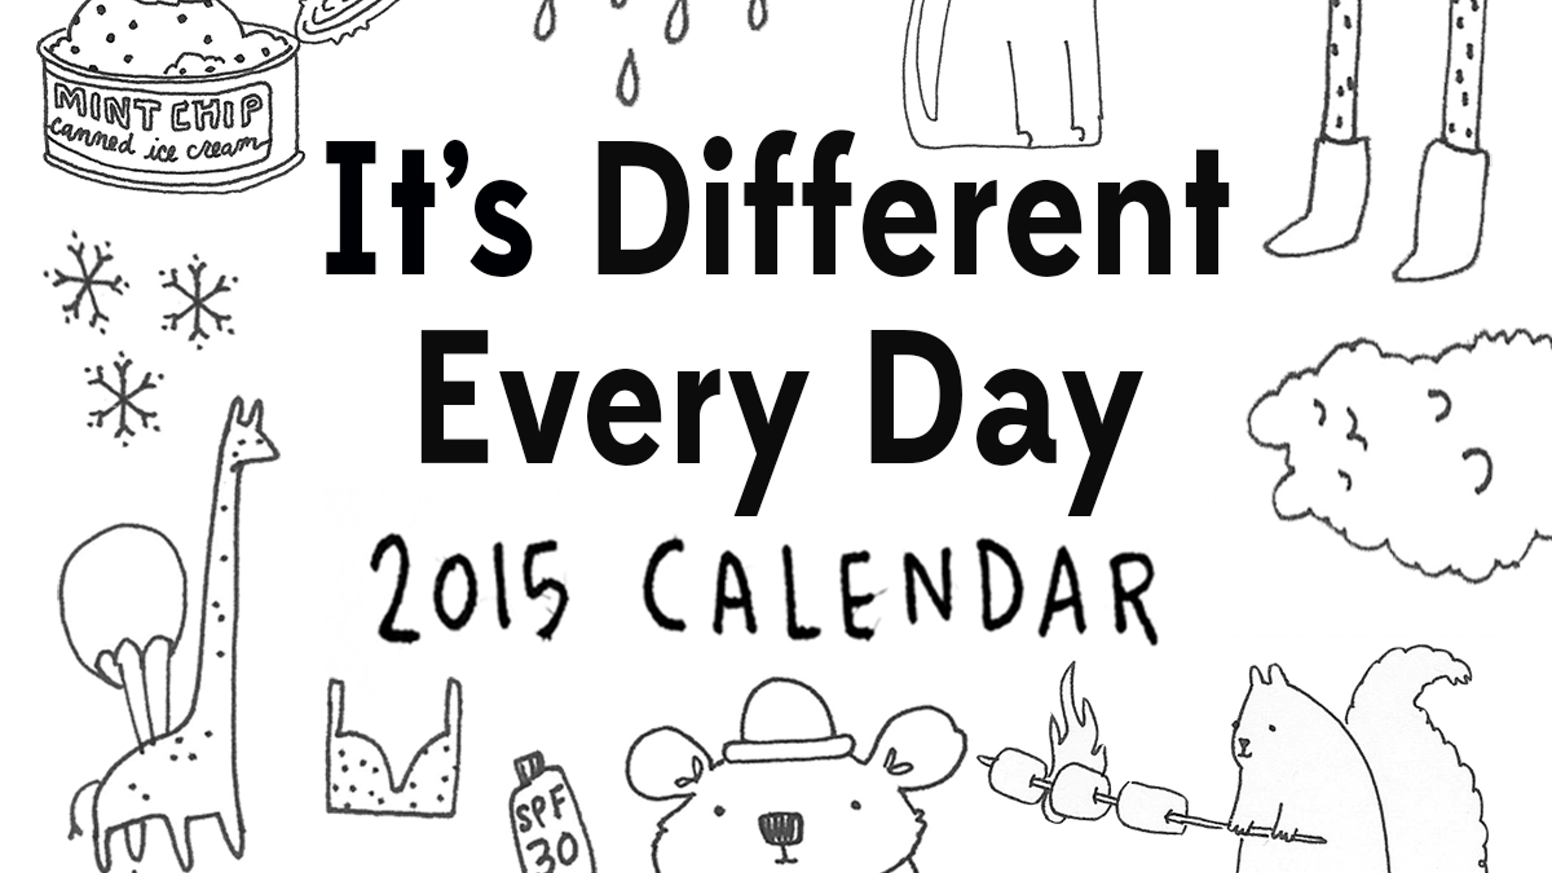 It's Different Every Day Calendar by Boaz — Kickstarter